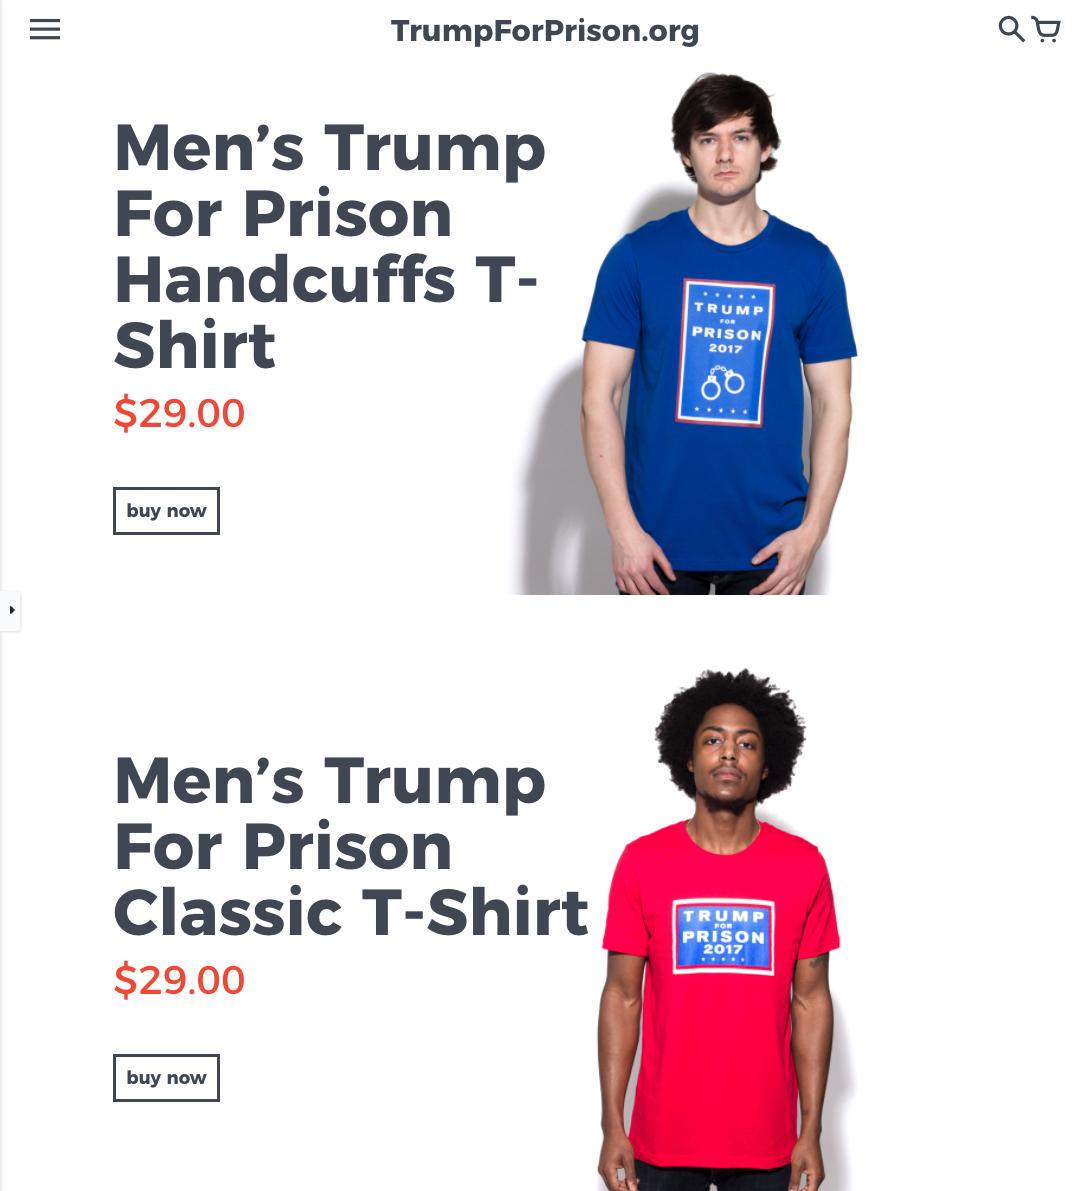 Trump For Prison website